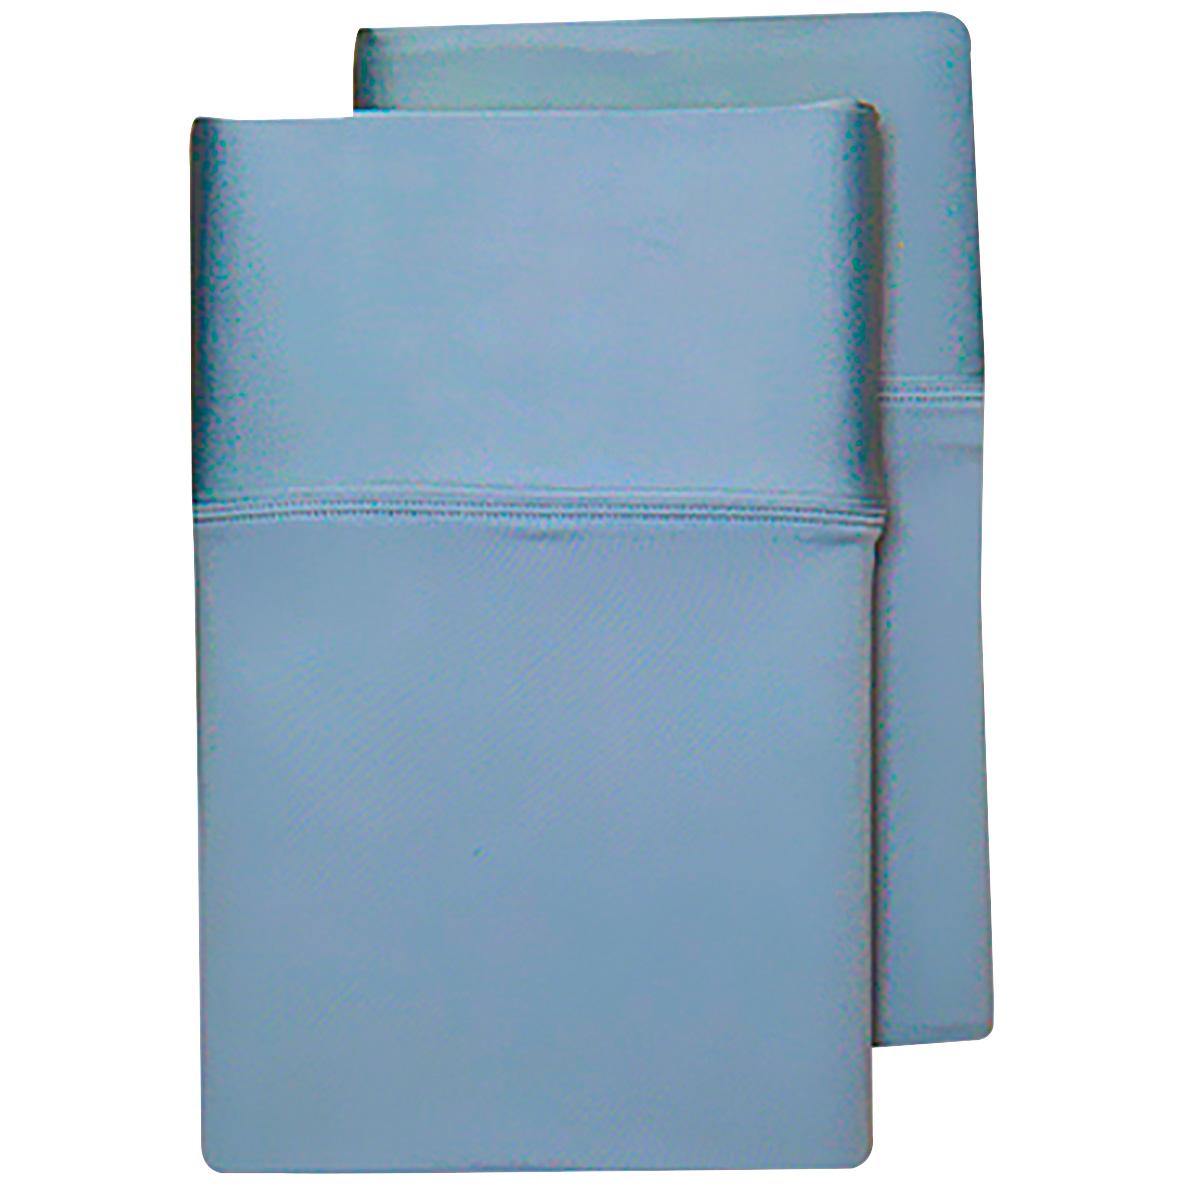 Sheex Inc. | SHEEX Aero Fit Carolina Blue King Pillowcase Set